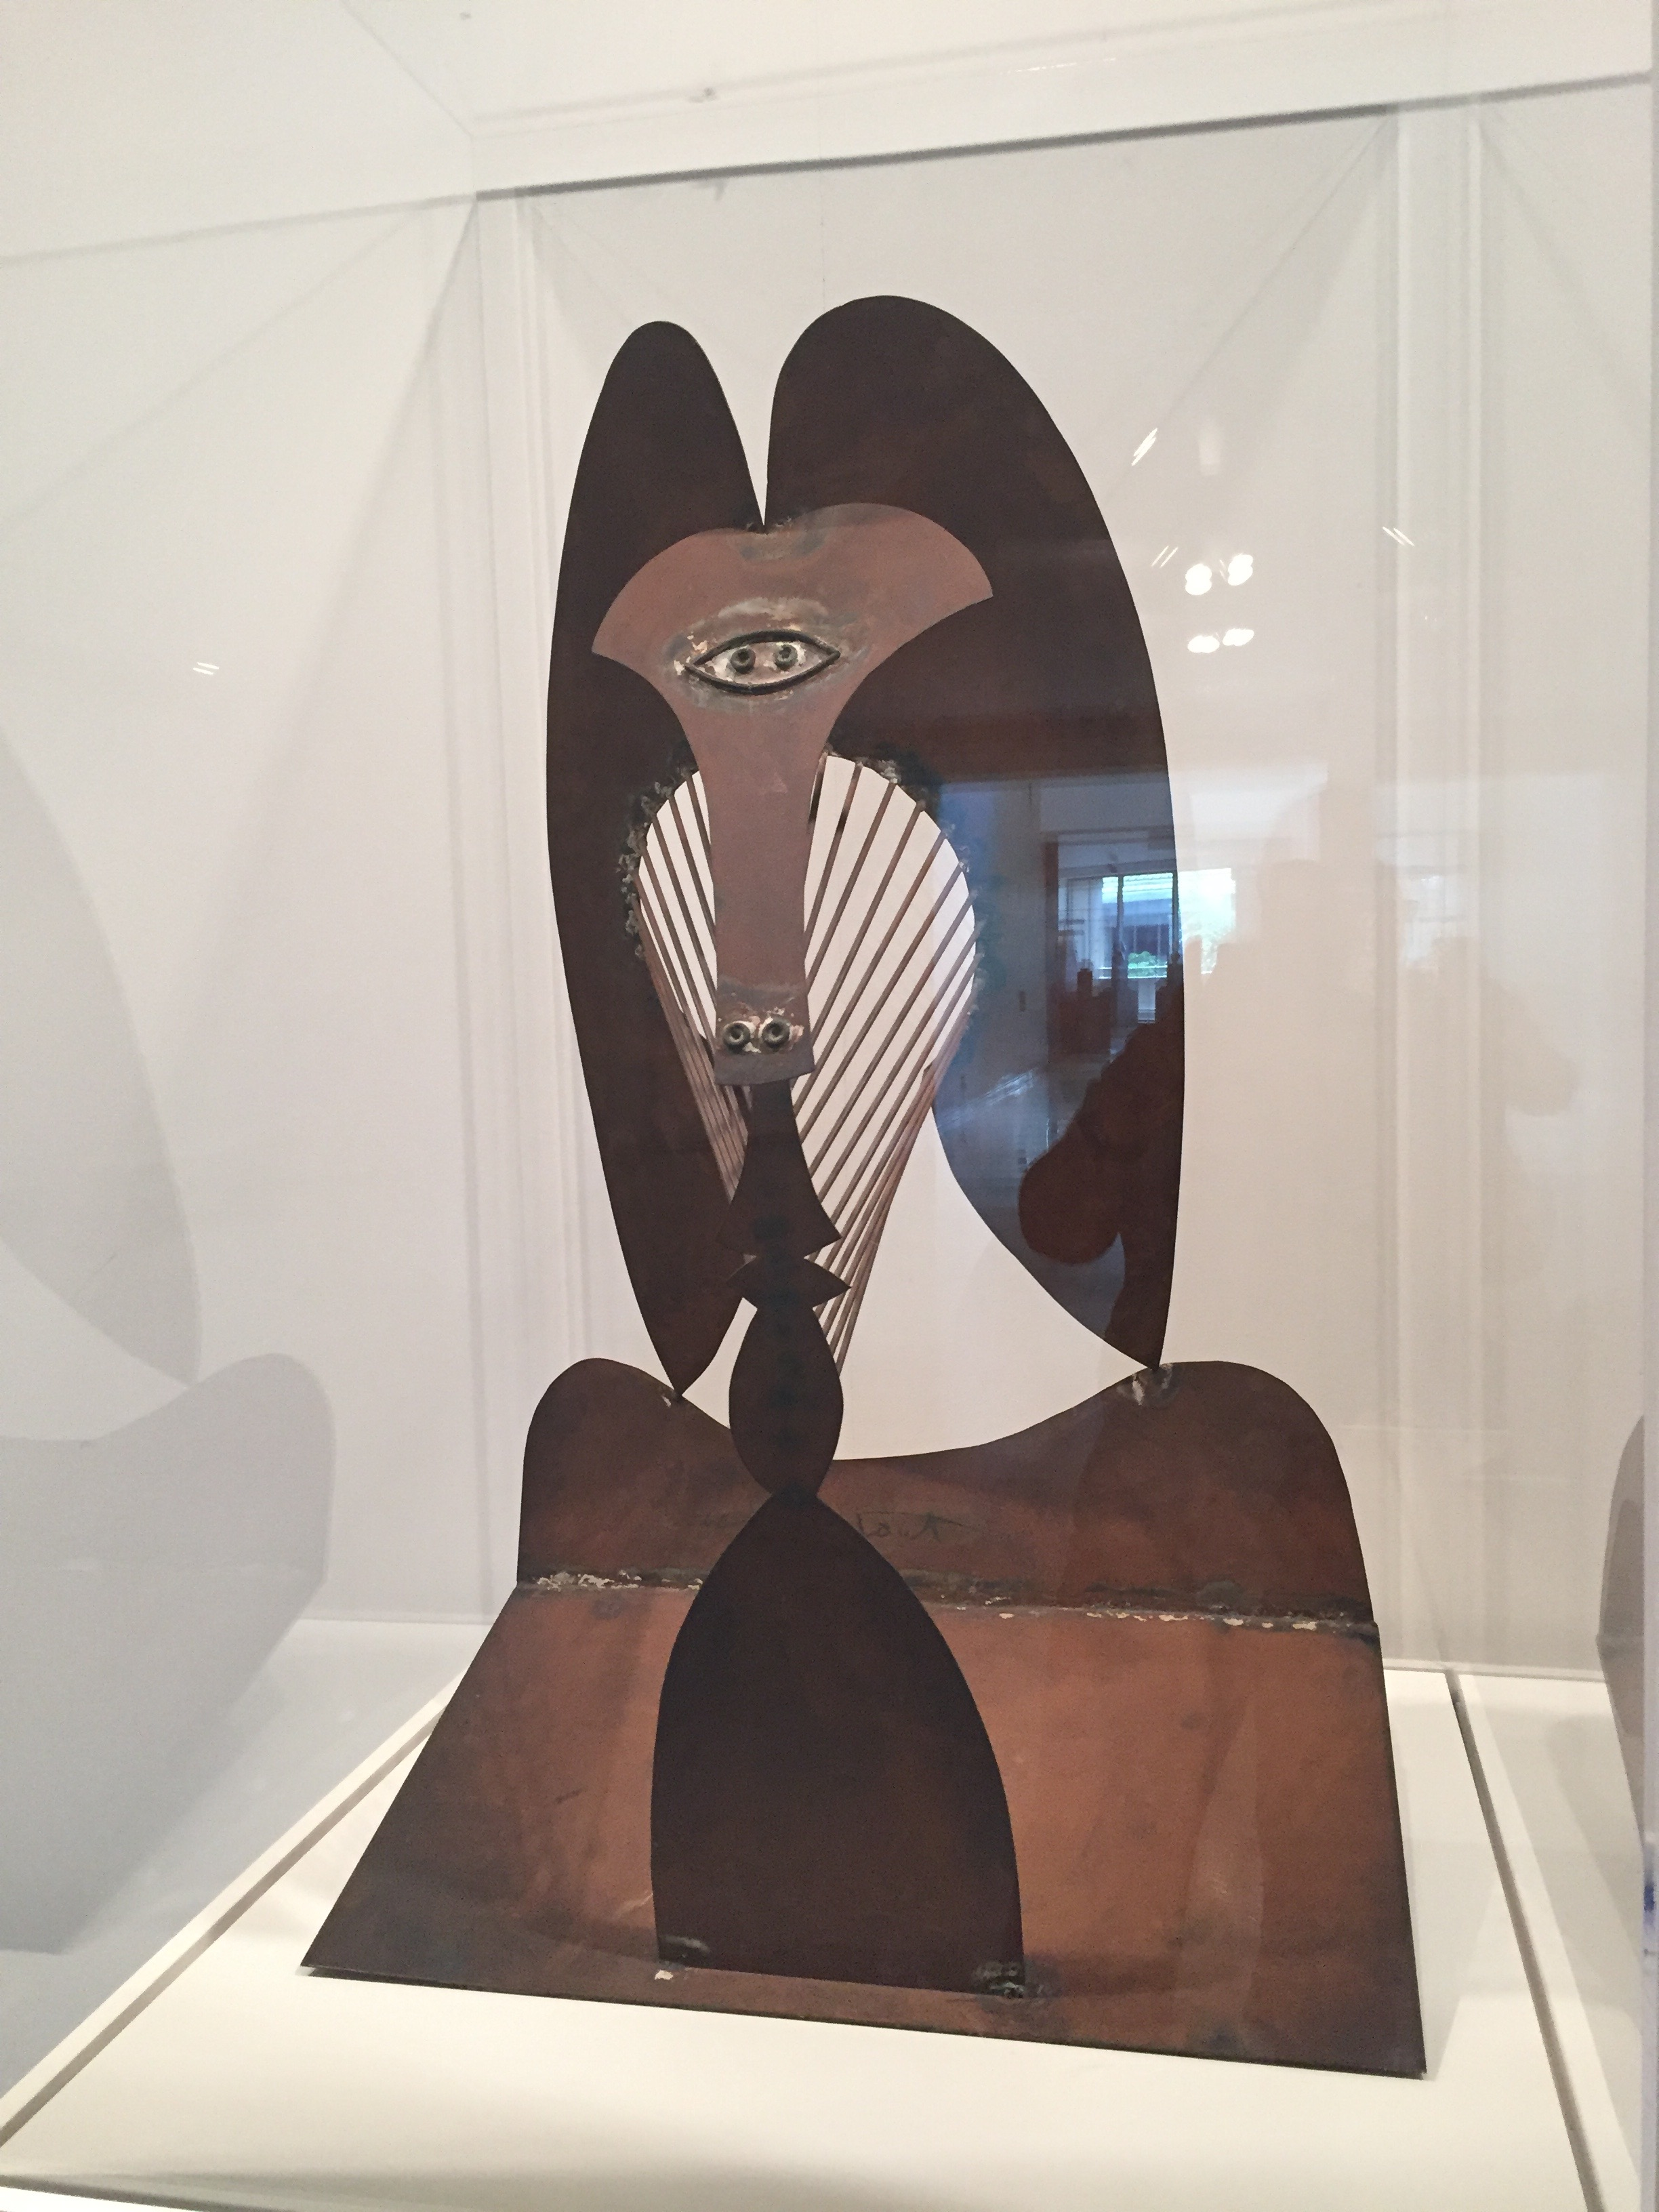 The original maquette of the Chicago sculpture located in the Art Institute of Chicago.